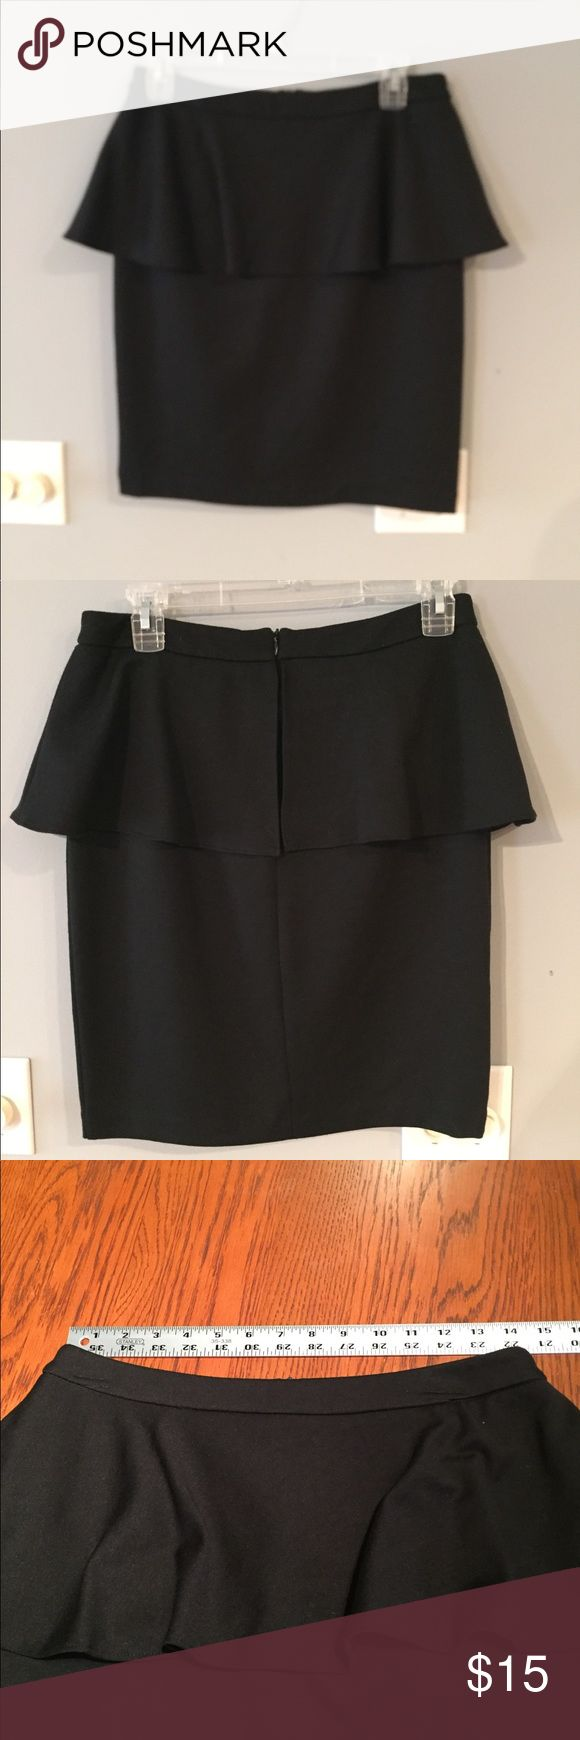 Cynthia Rowley Black Peplum Skirt Gently used, Cynthia Rowley black peplum skirt Cynthia Rowley Skirts